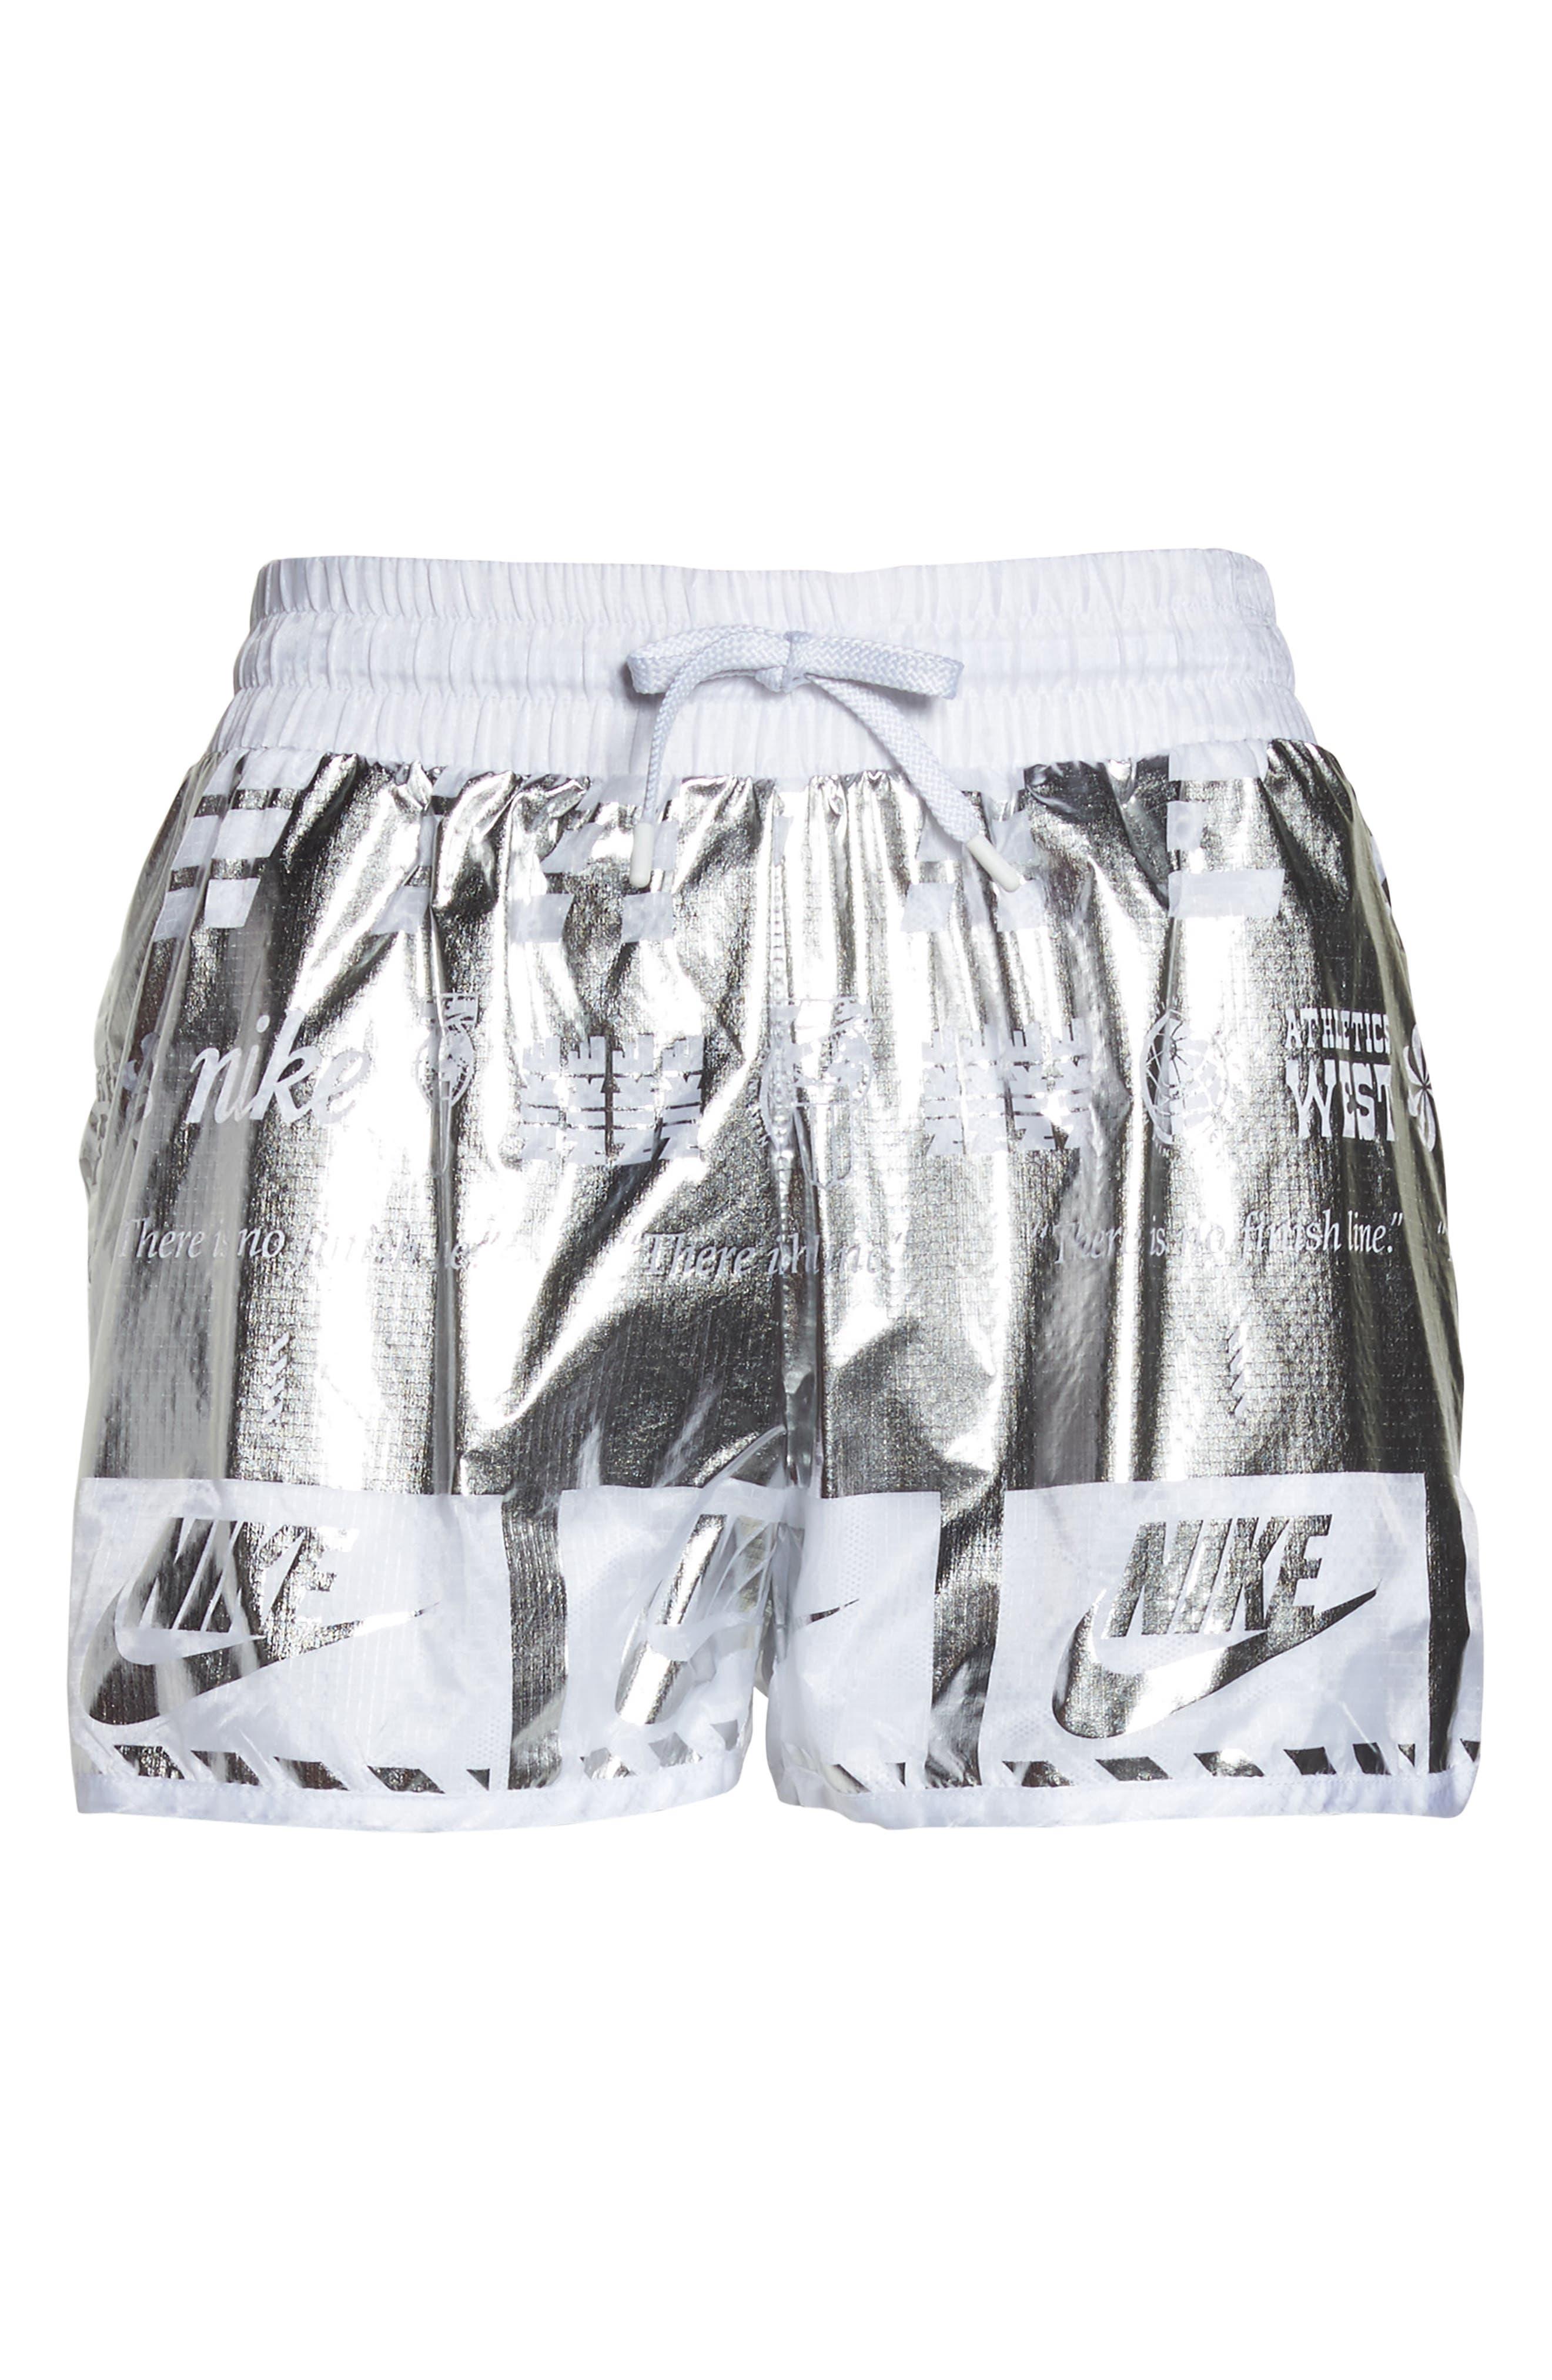 Sportswear Women's Metallic Shorts,                             Alternate thumbnail 7, color,                             White/ White